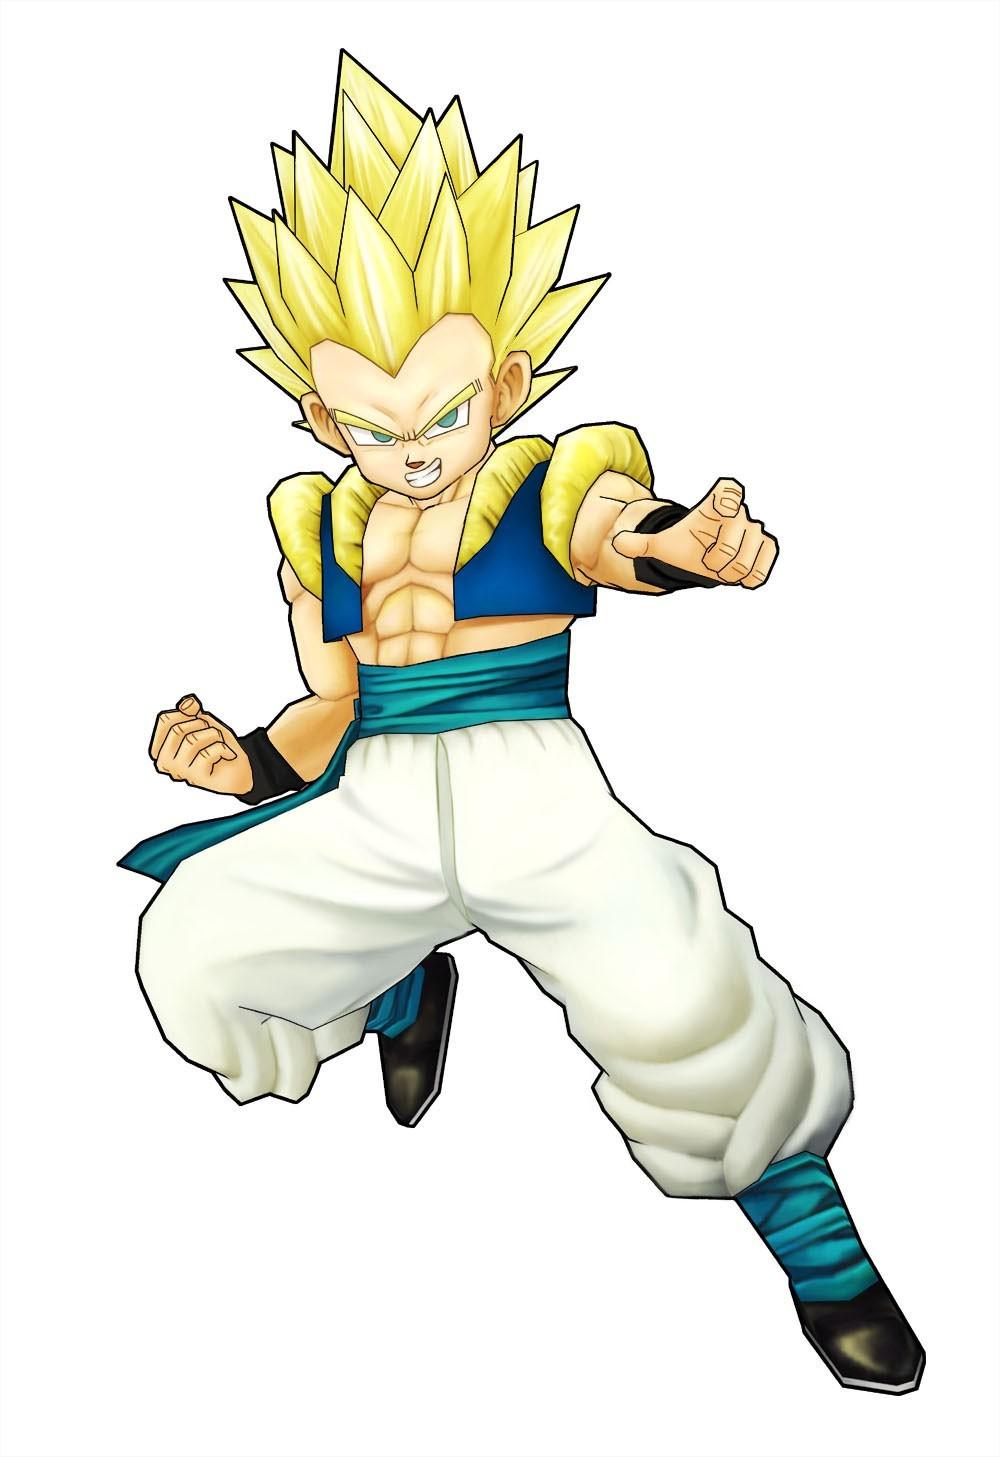 Les personnages de dragon ball z tenkaichi tag team - Image de dragon ball z ...